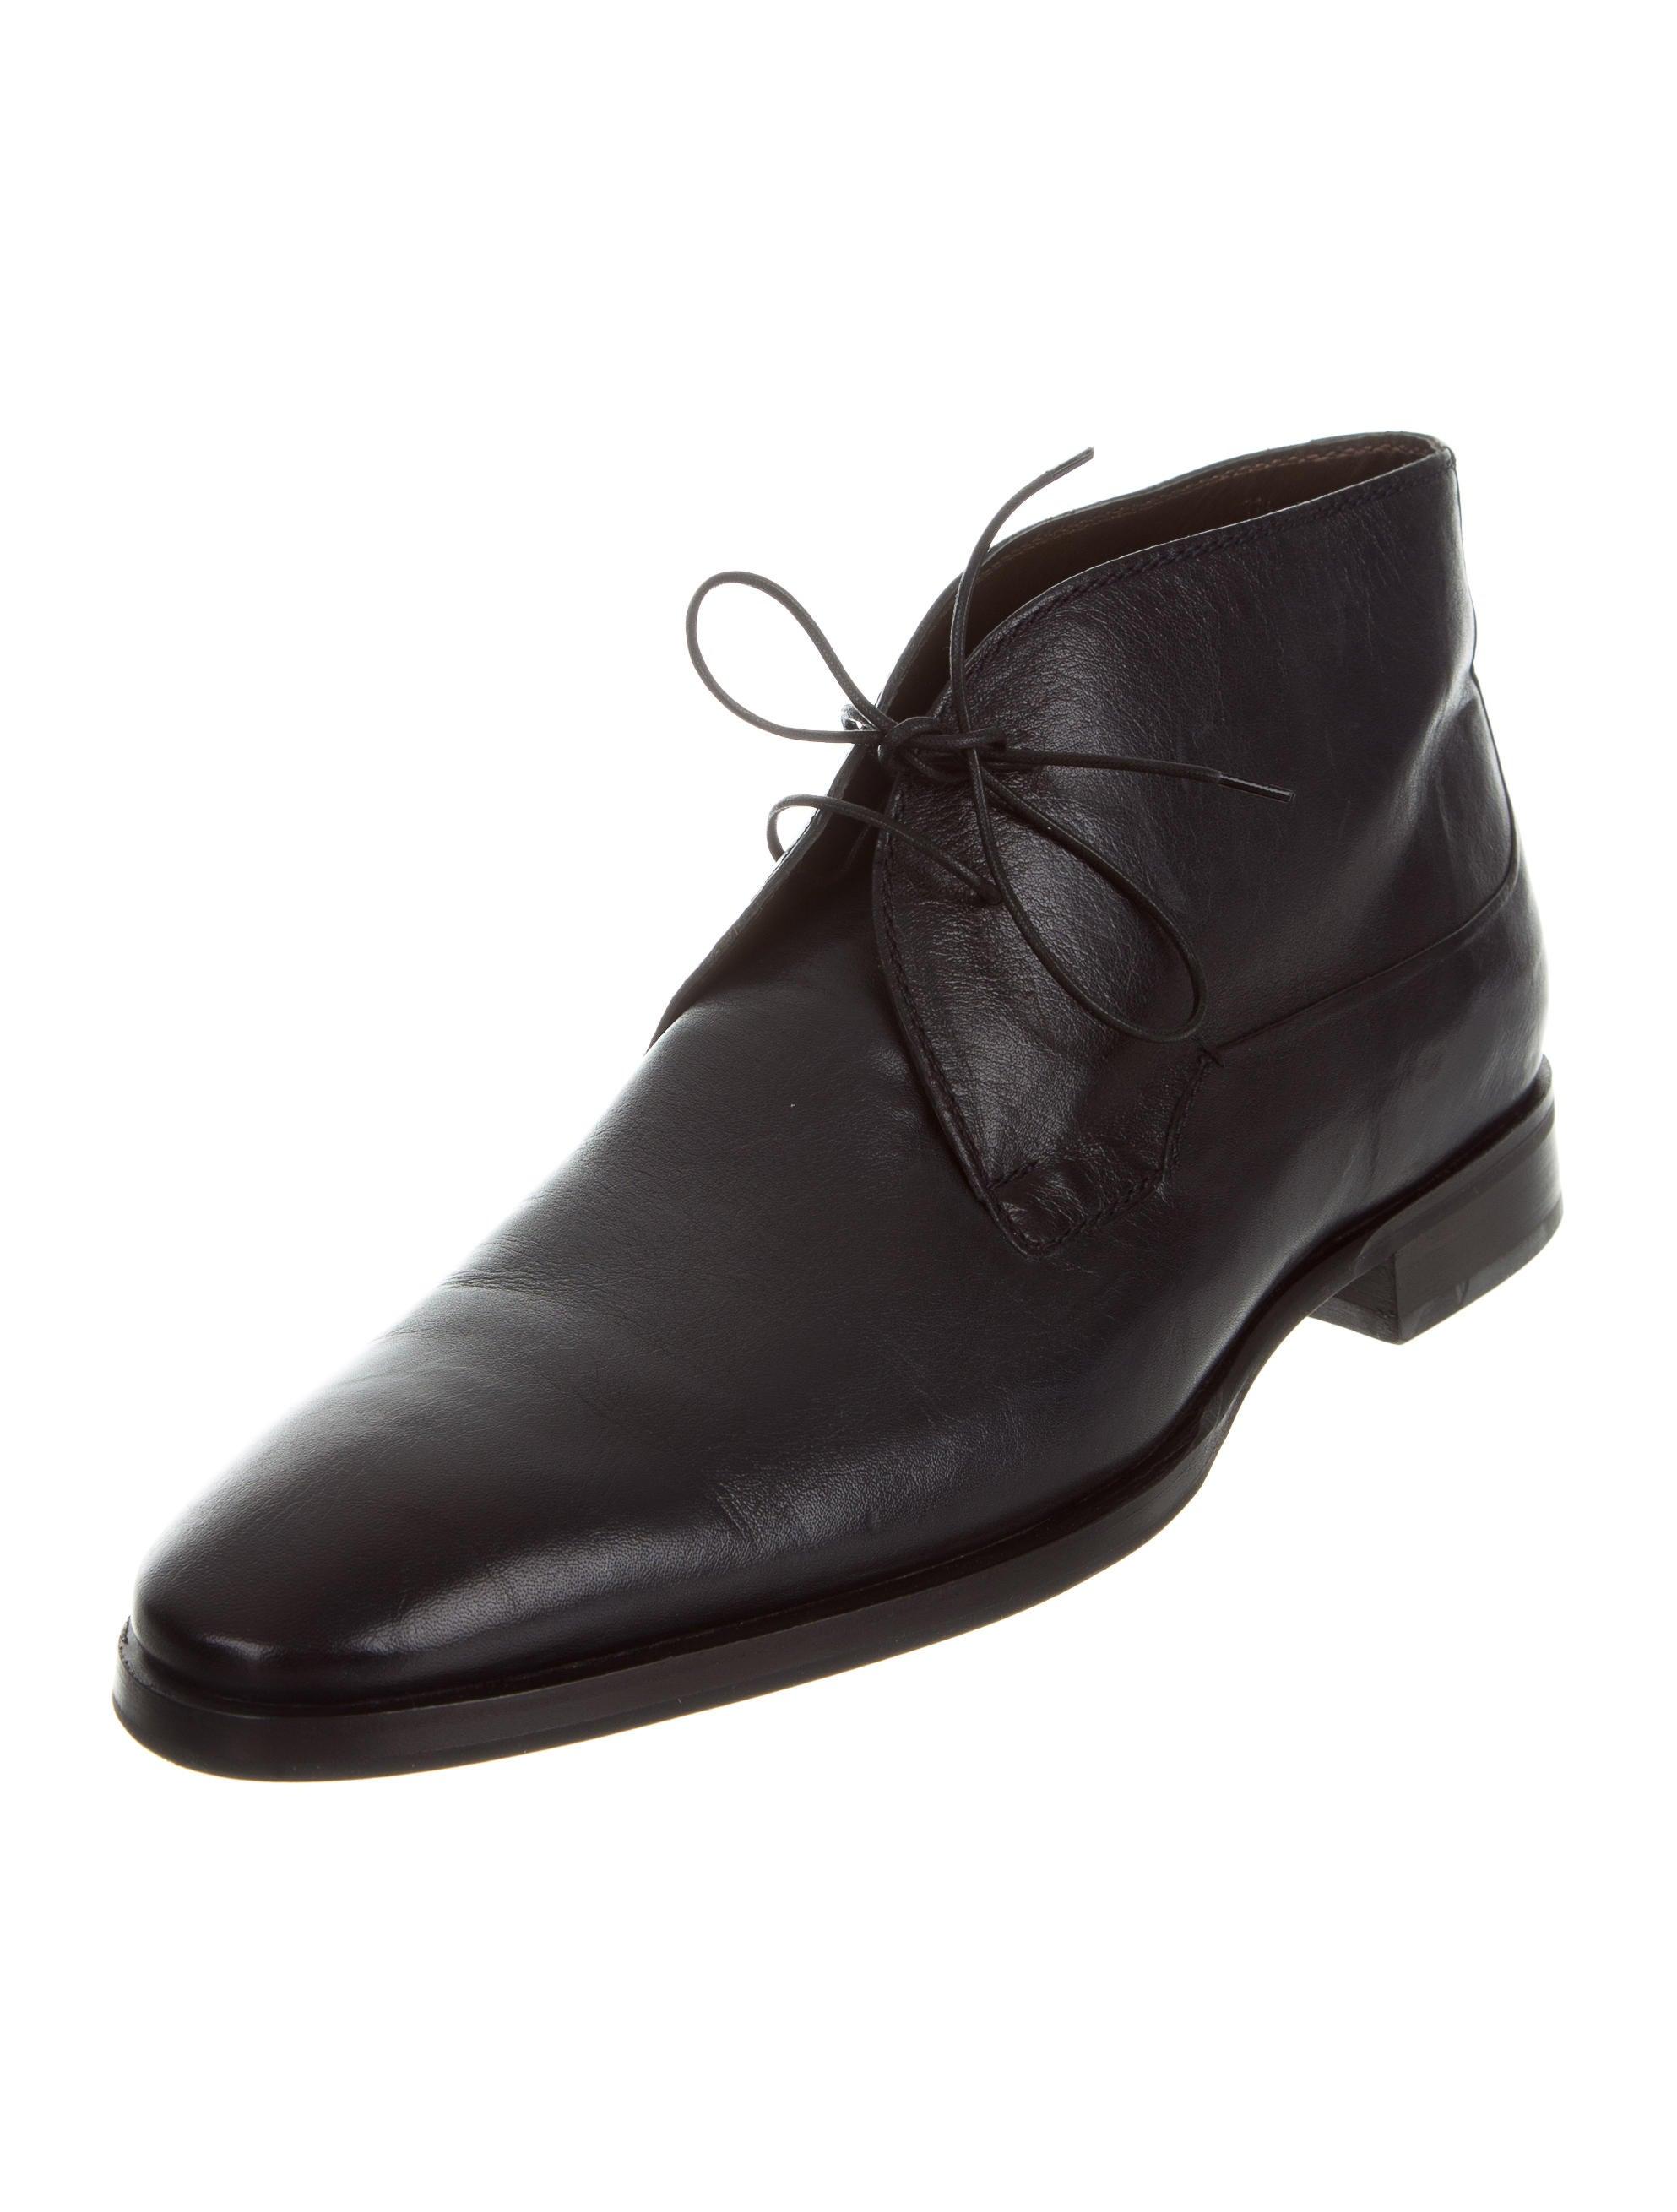 Jack & Jones leather desert boots. £ Jack & Jones suede desert boots. £ ASOS DESIGN desert boots in tan leather with suede detail. New Look faux suede desert shoe in brown. £ New Look Faux Suede Desert Boots In Tan. £ ASOS Wide Fit Desert Boots In Tan Suede With Leather .